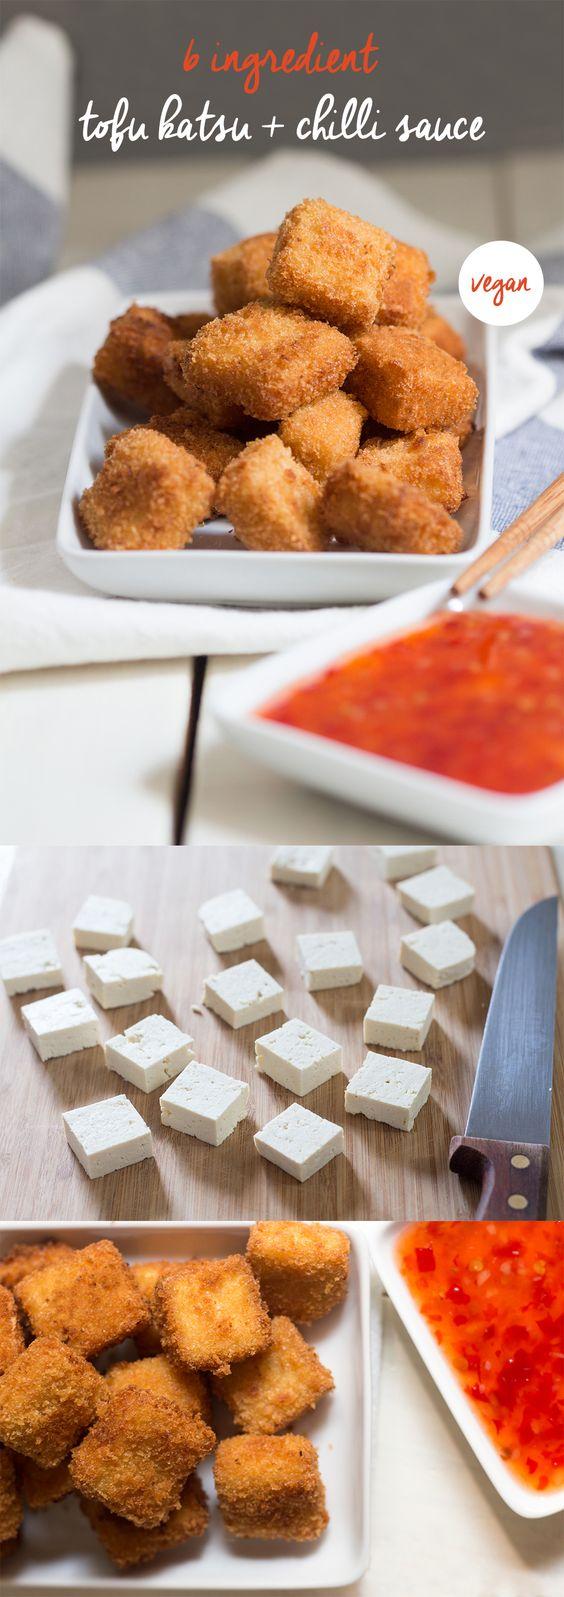 6 ingredient, crispy tofu katsu, anyone? It's best enjoyed with a side of sweet chilli sauce